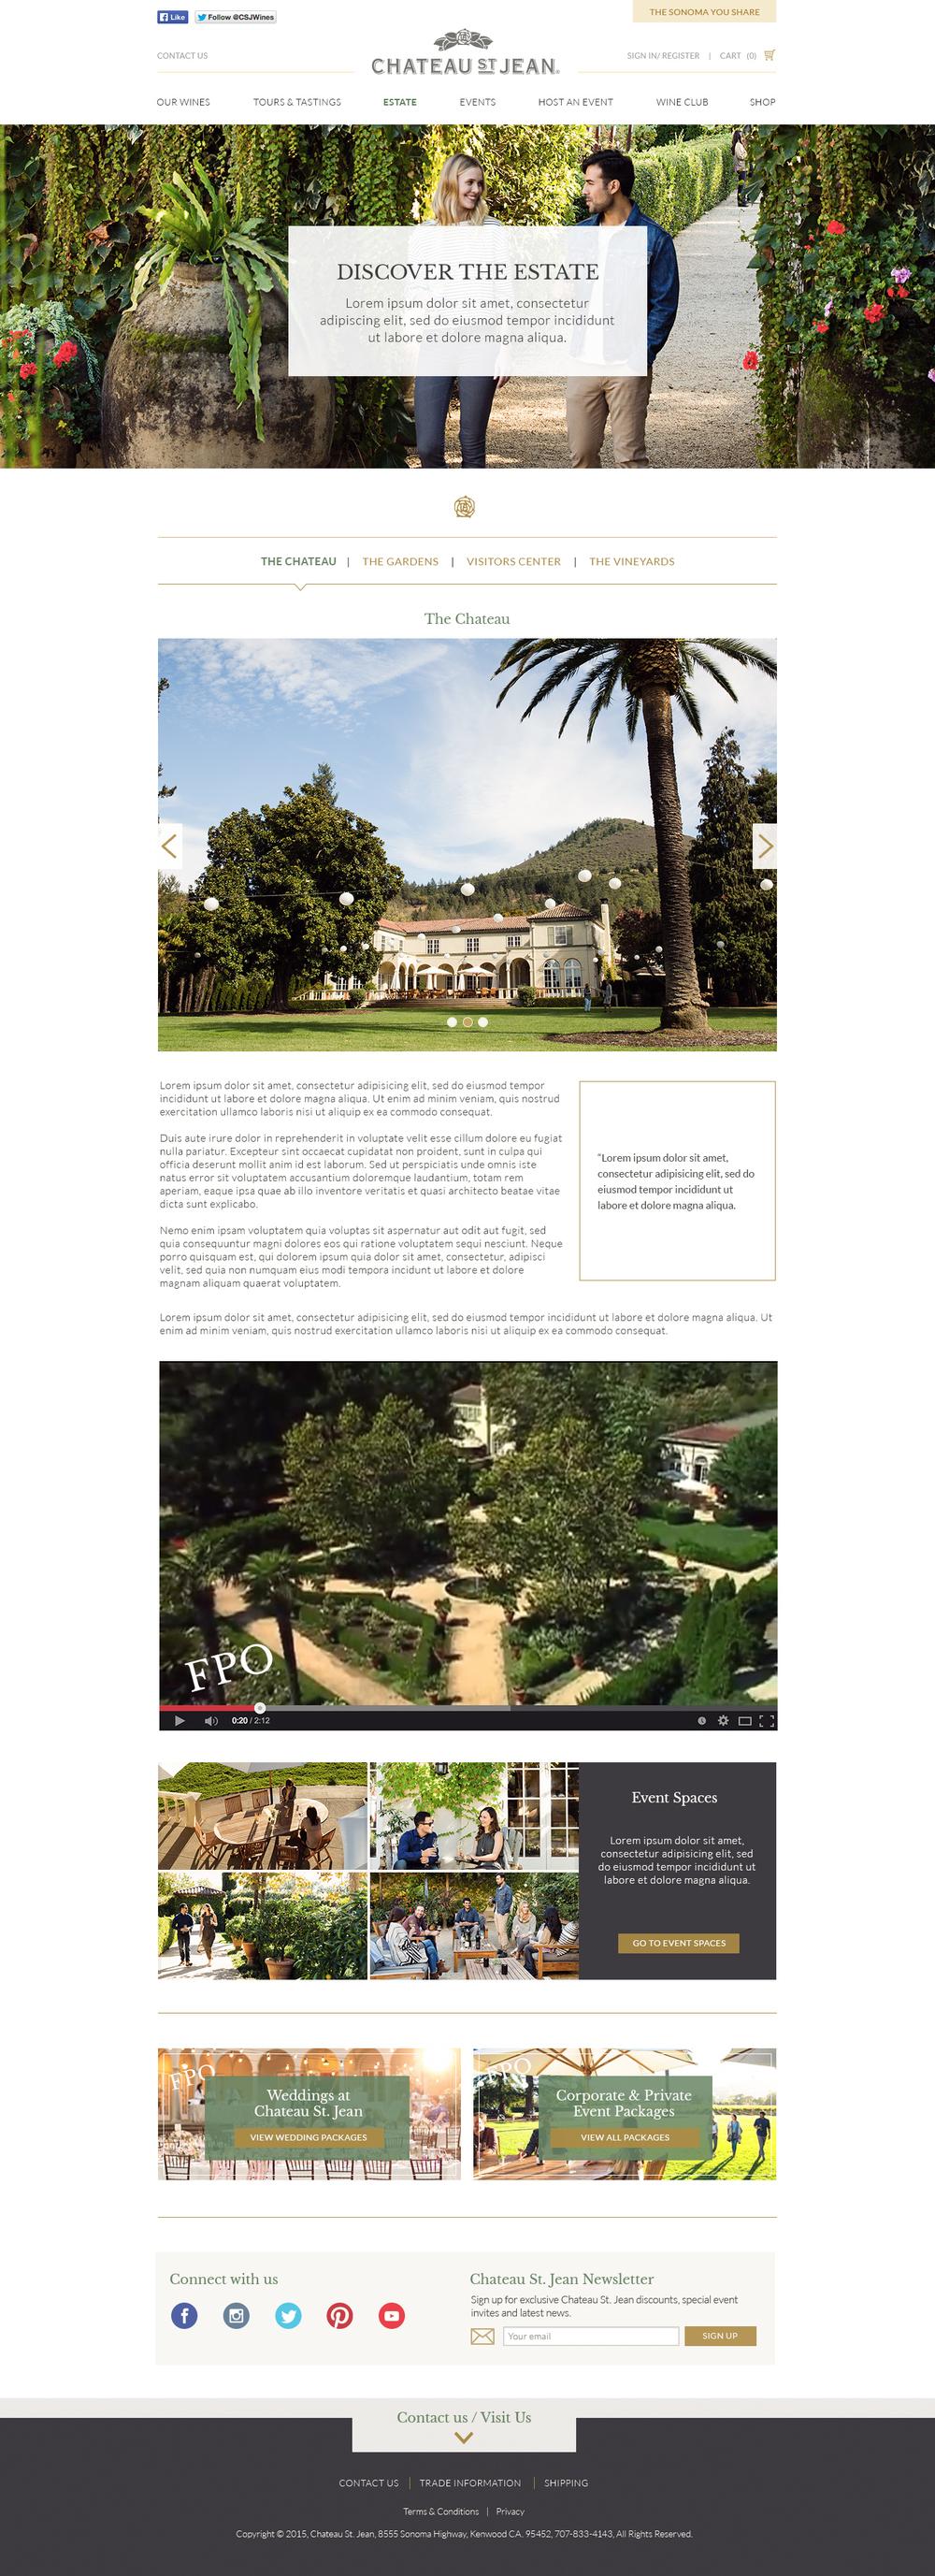 TRE01-018_CSJ-Website-Redesign_03Estate_3.1DiscoverThe-Estate_v00.02.jpg